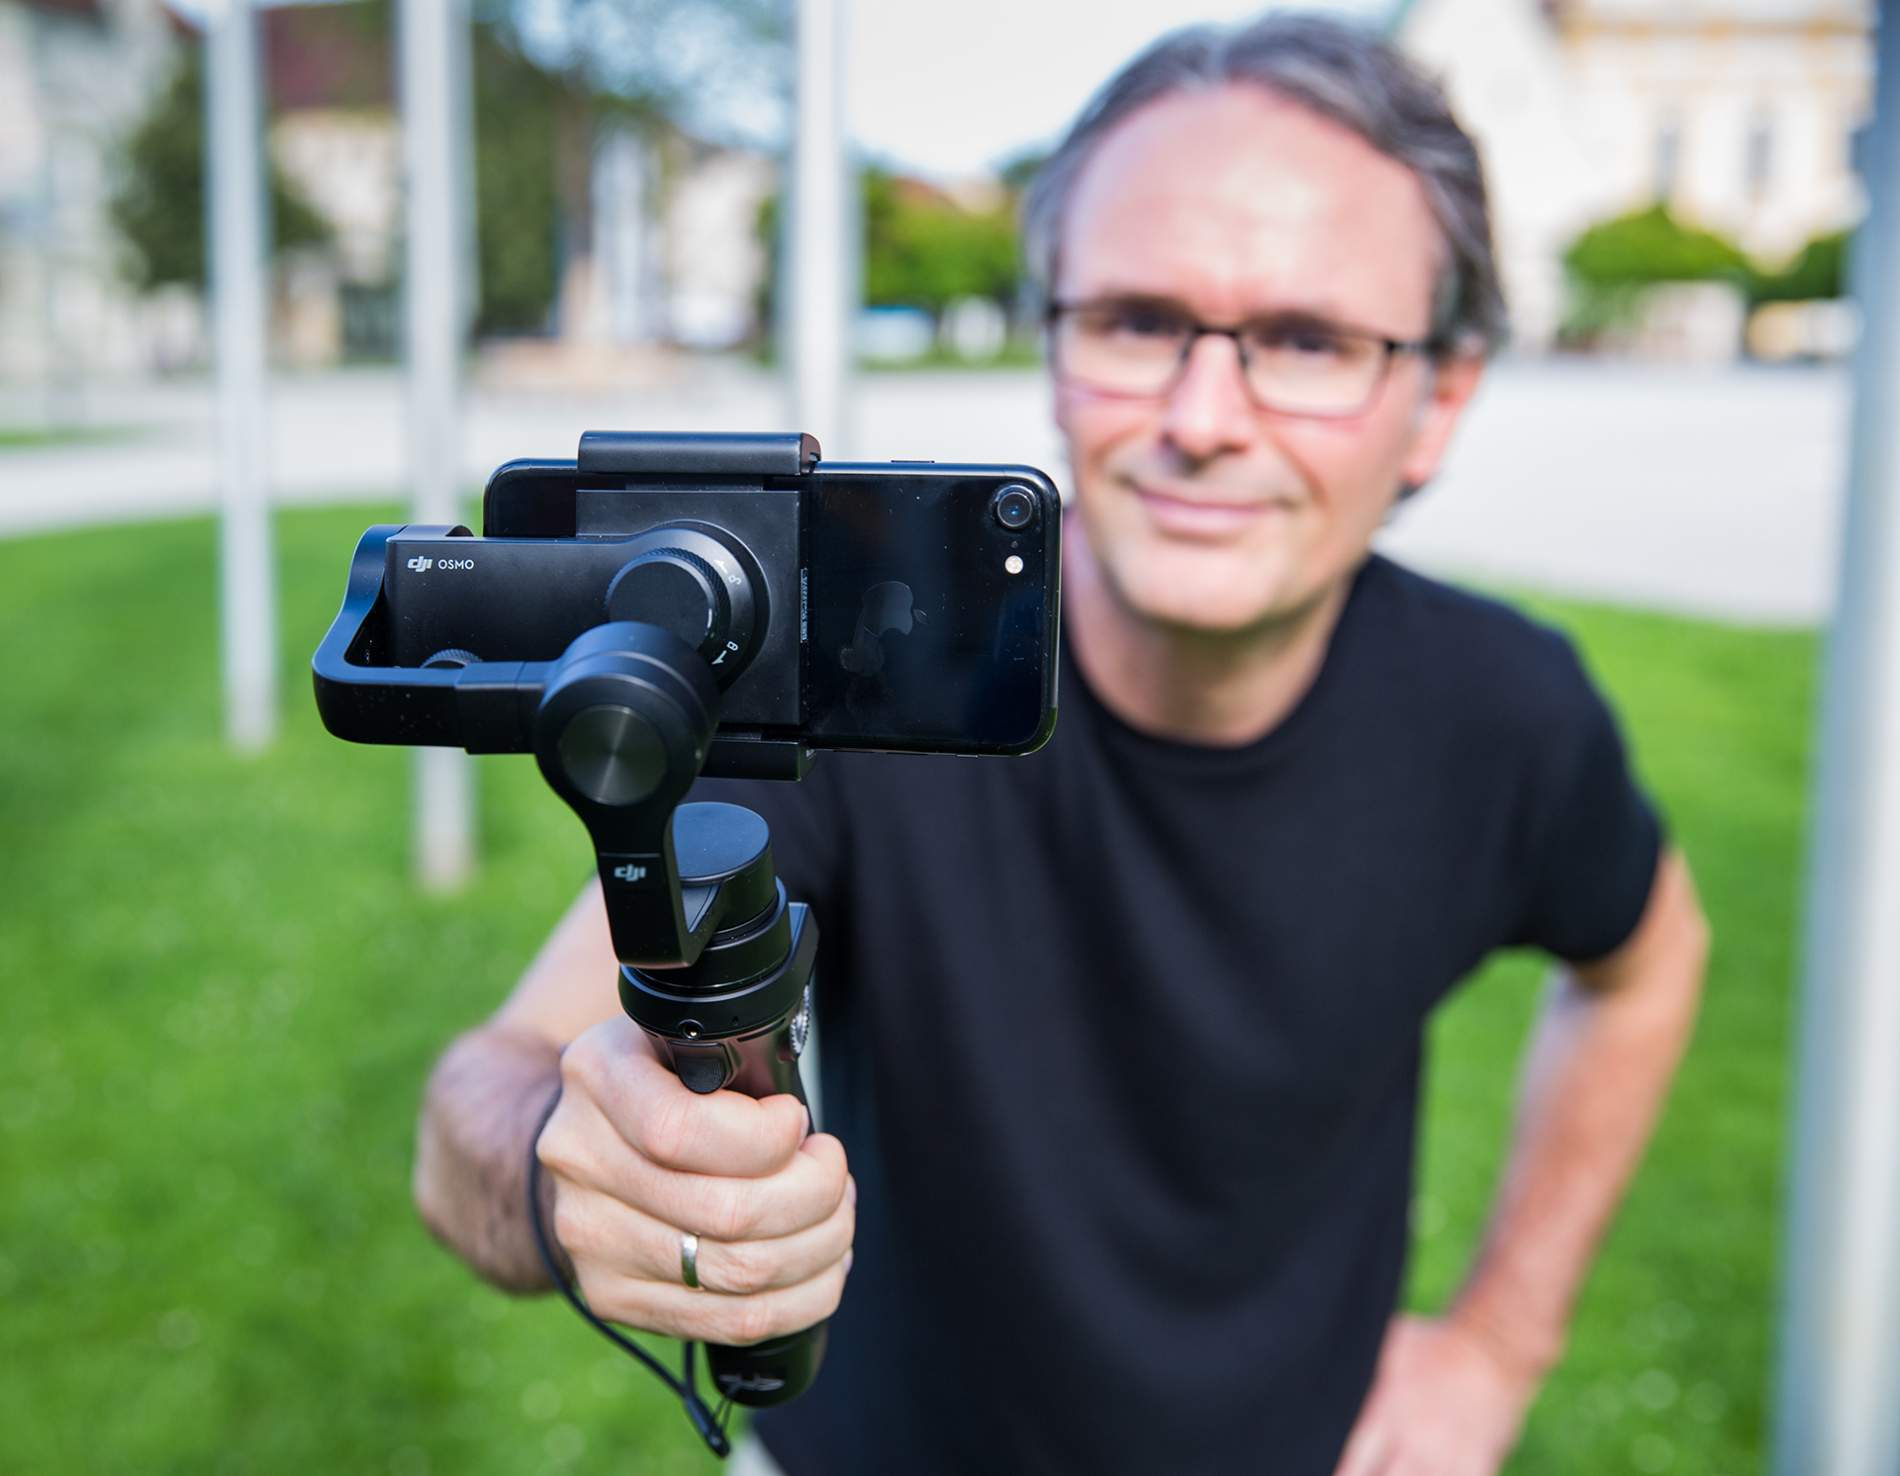 Günter Exel (Tourismuszukunft): Mobile Video